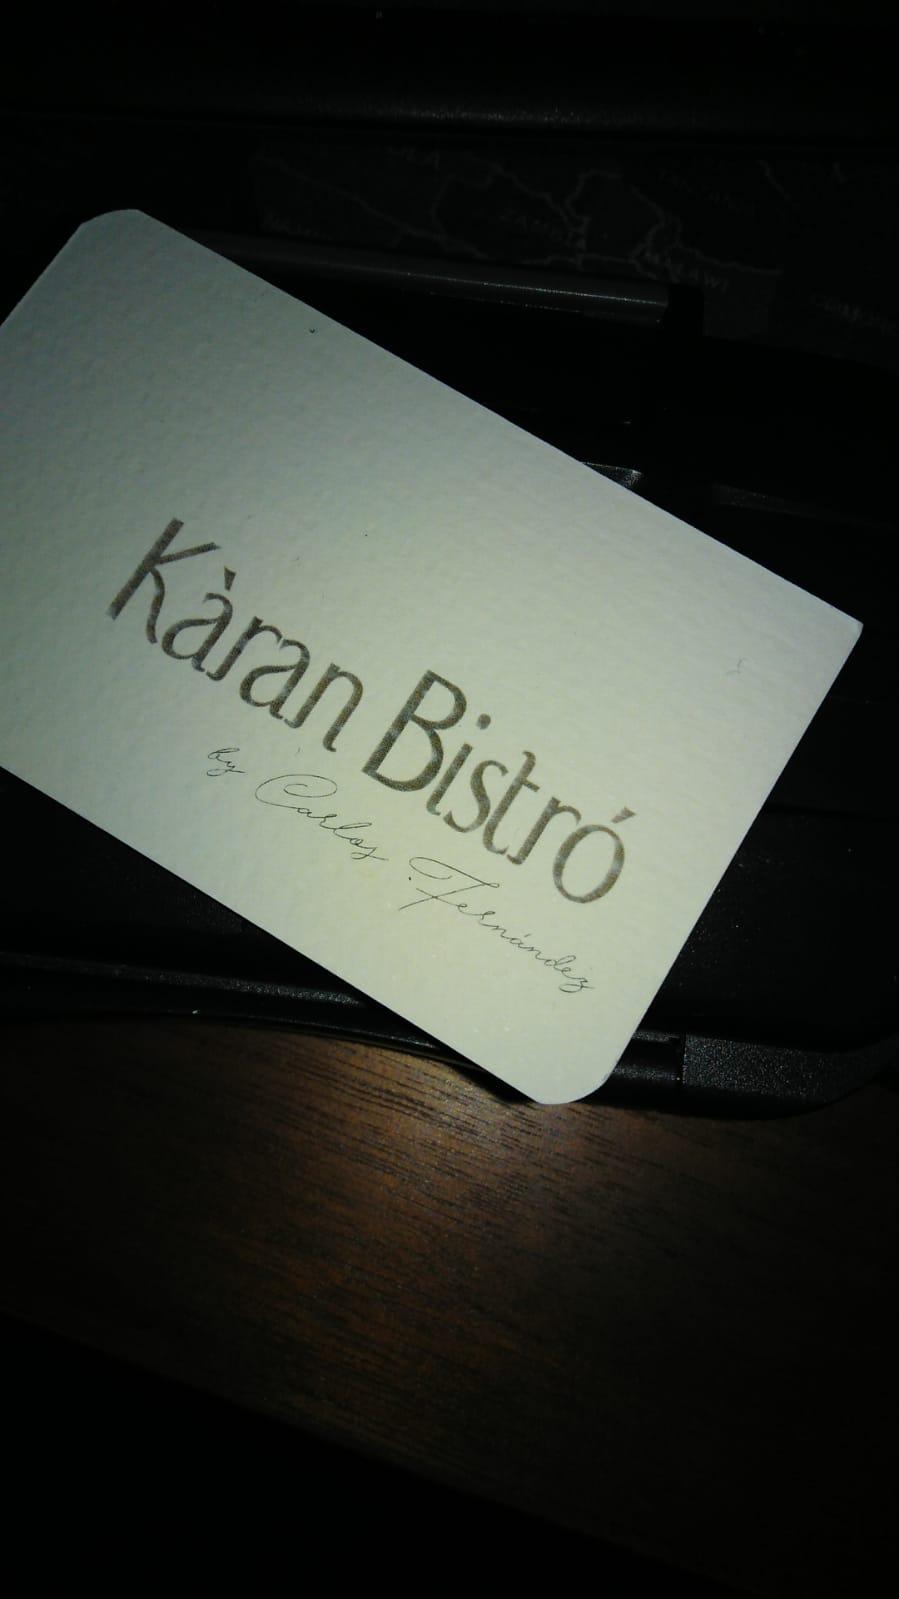 Reservas Kàran Bistró